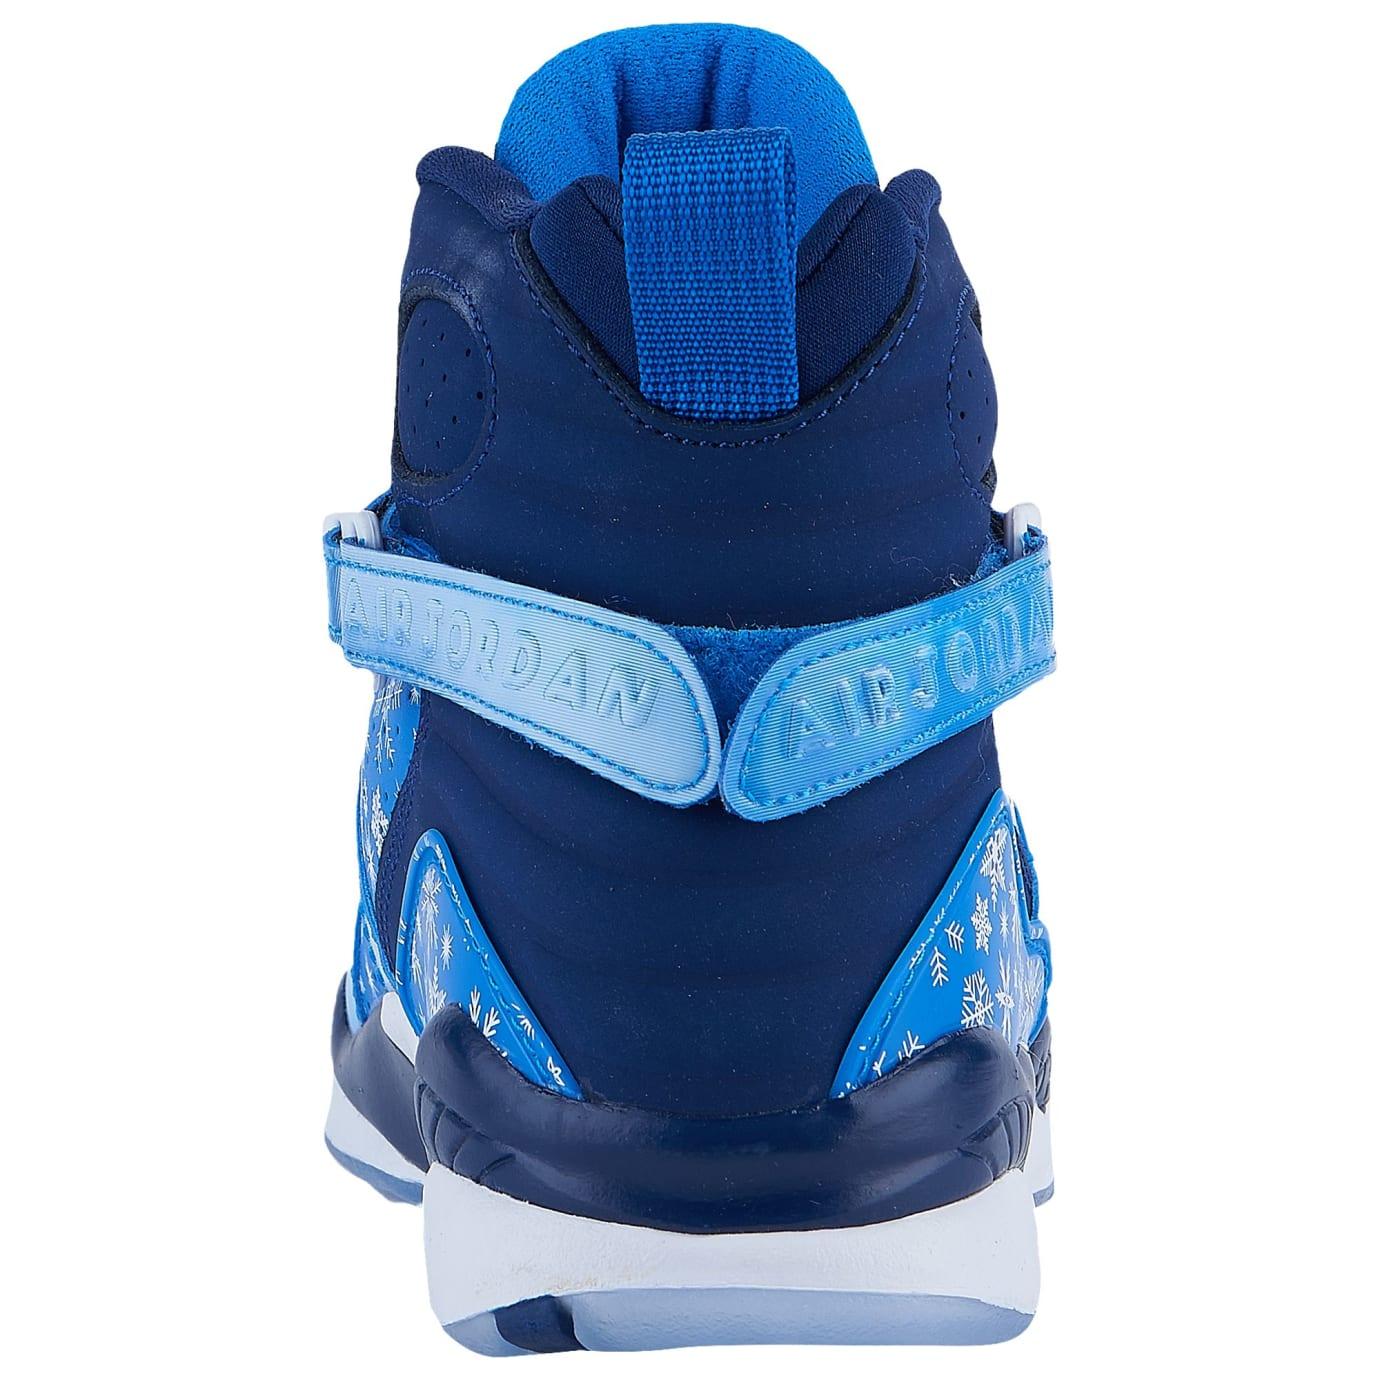 9988eb9d326e Air Jordan 8 VIII Snowflake Release Date 305368-400 Heel